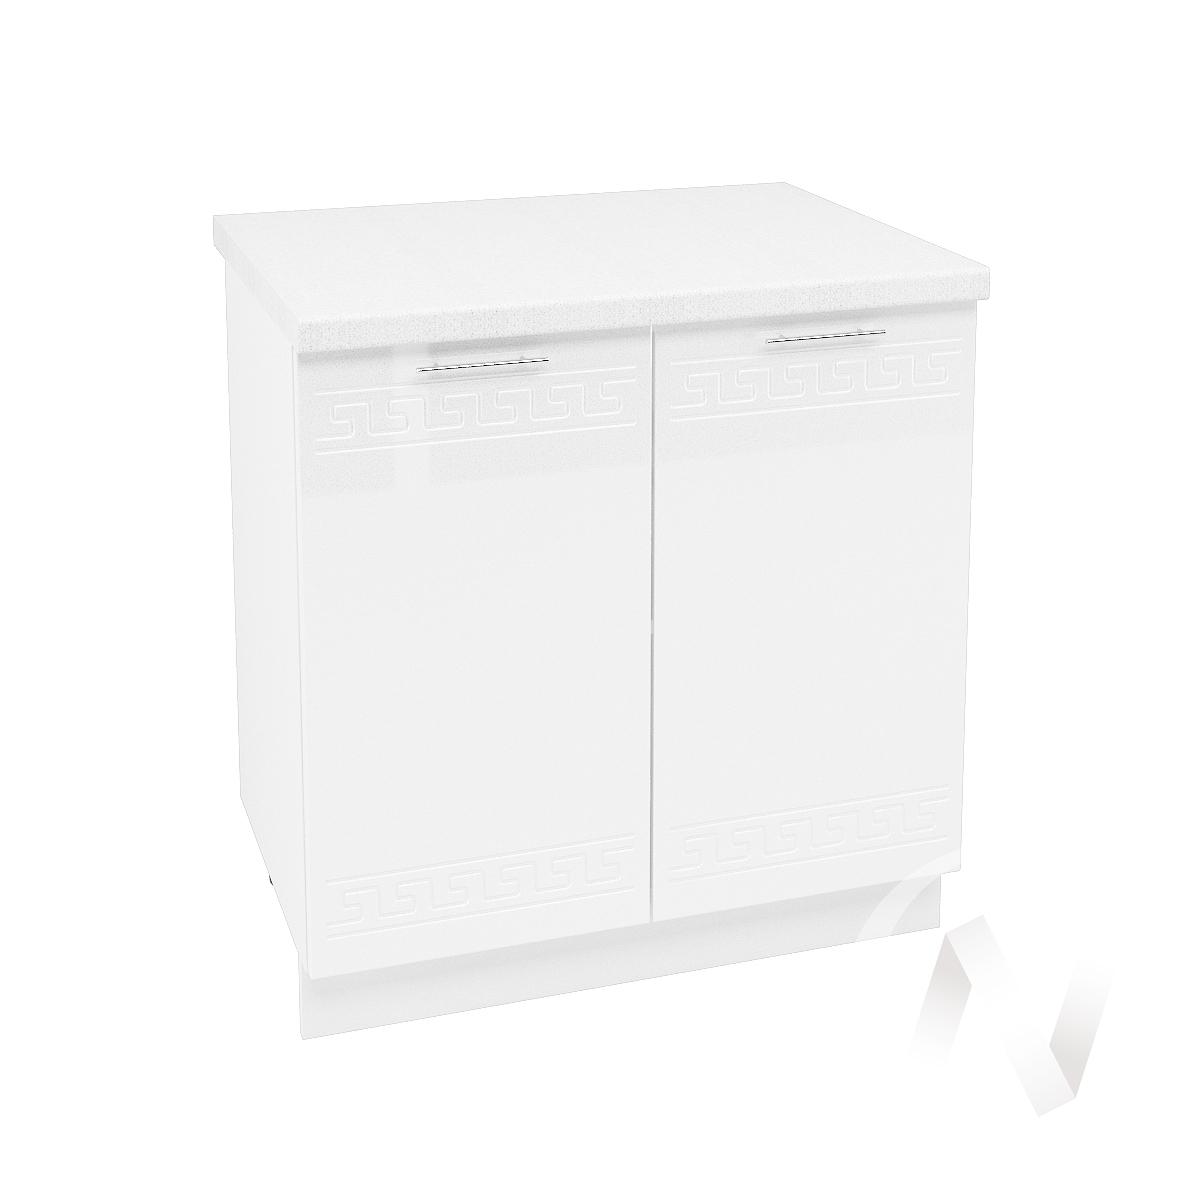 "Кухня ""Греция"": Шкаф нижний 800, ШН 800 новый (белый металлик/корпус белый)"